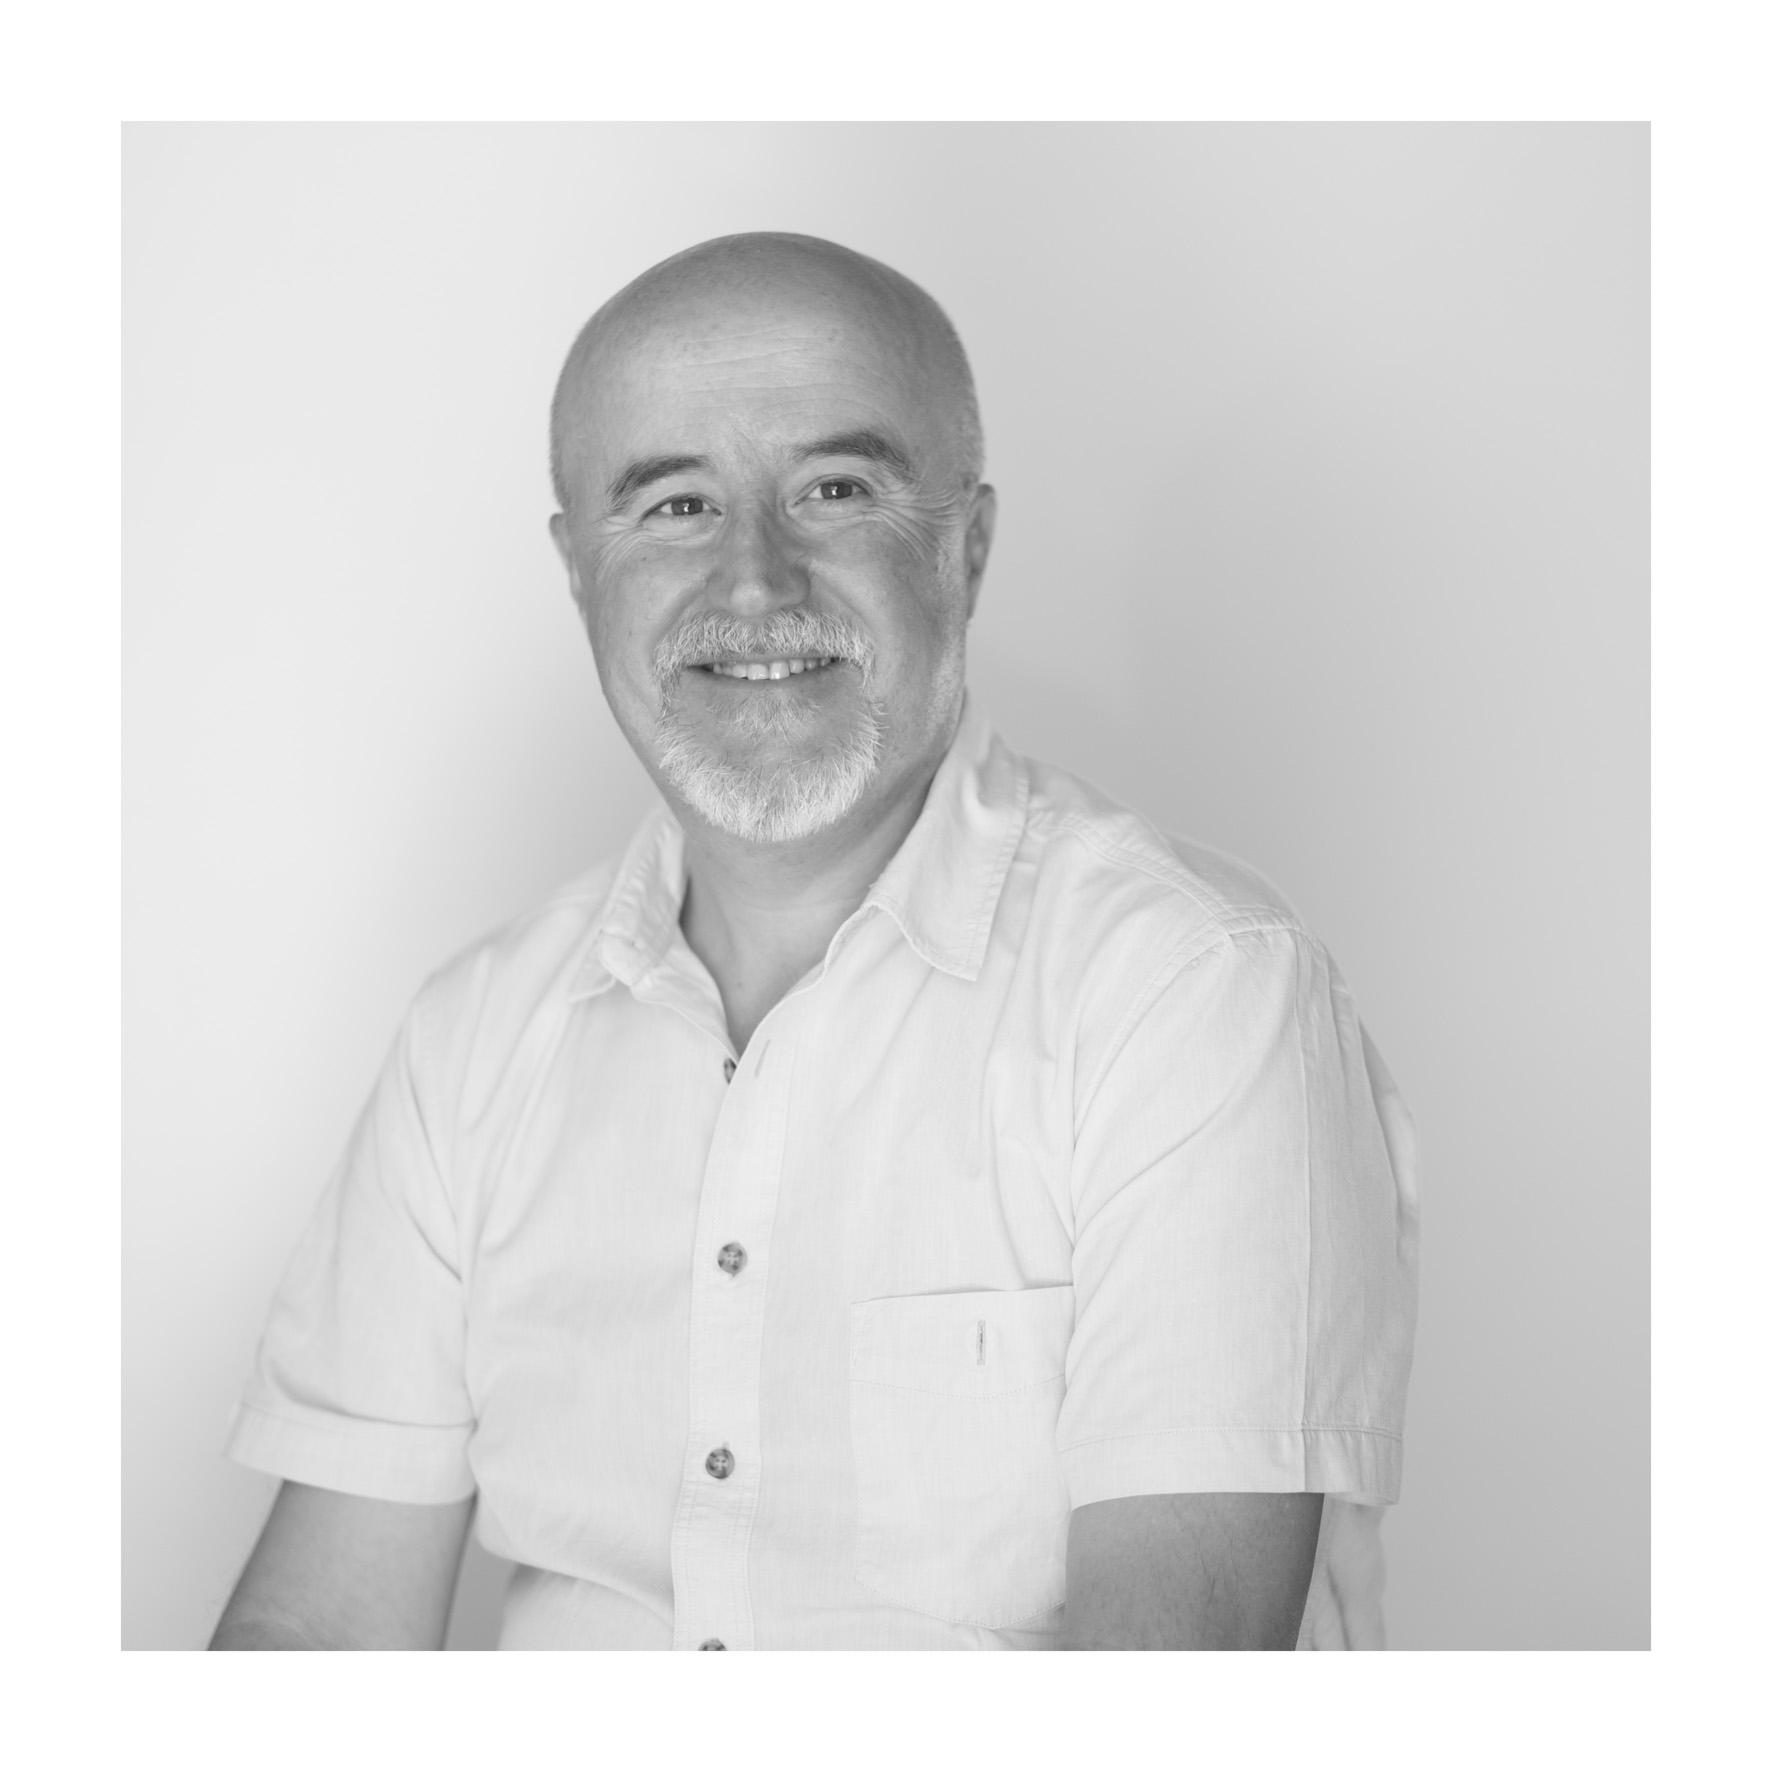 Juan Manuel Estévez (juan_manuel_estevez.jpg)